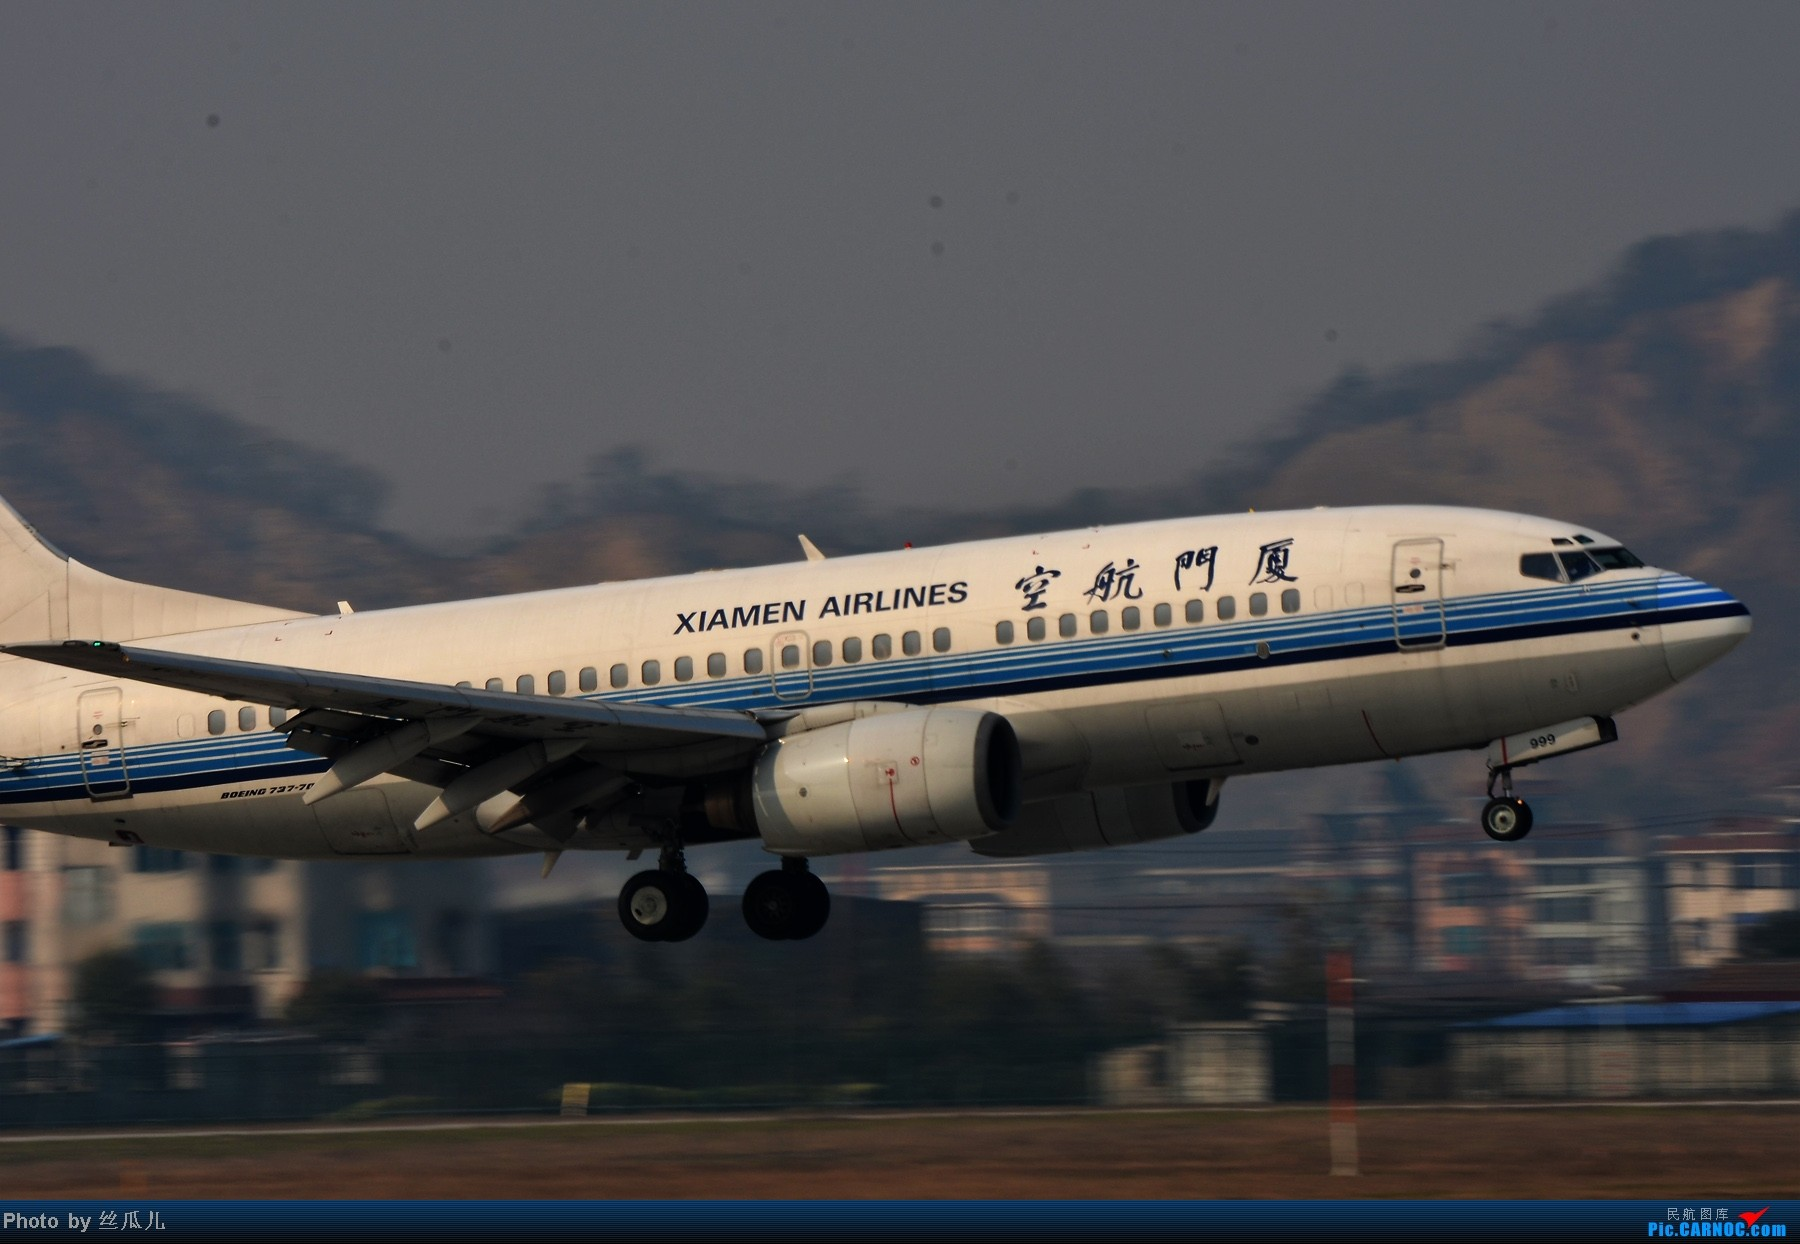 Re:[原创]【HGH二跑】话说如今的二跑有了制高点--趁今天雾霾好转一点赶紧去练练甩腰--今日中午二跑拍机一小时全记录 BOEING 737-700 B-2999 中国杭州萧山机场